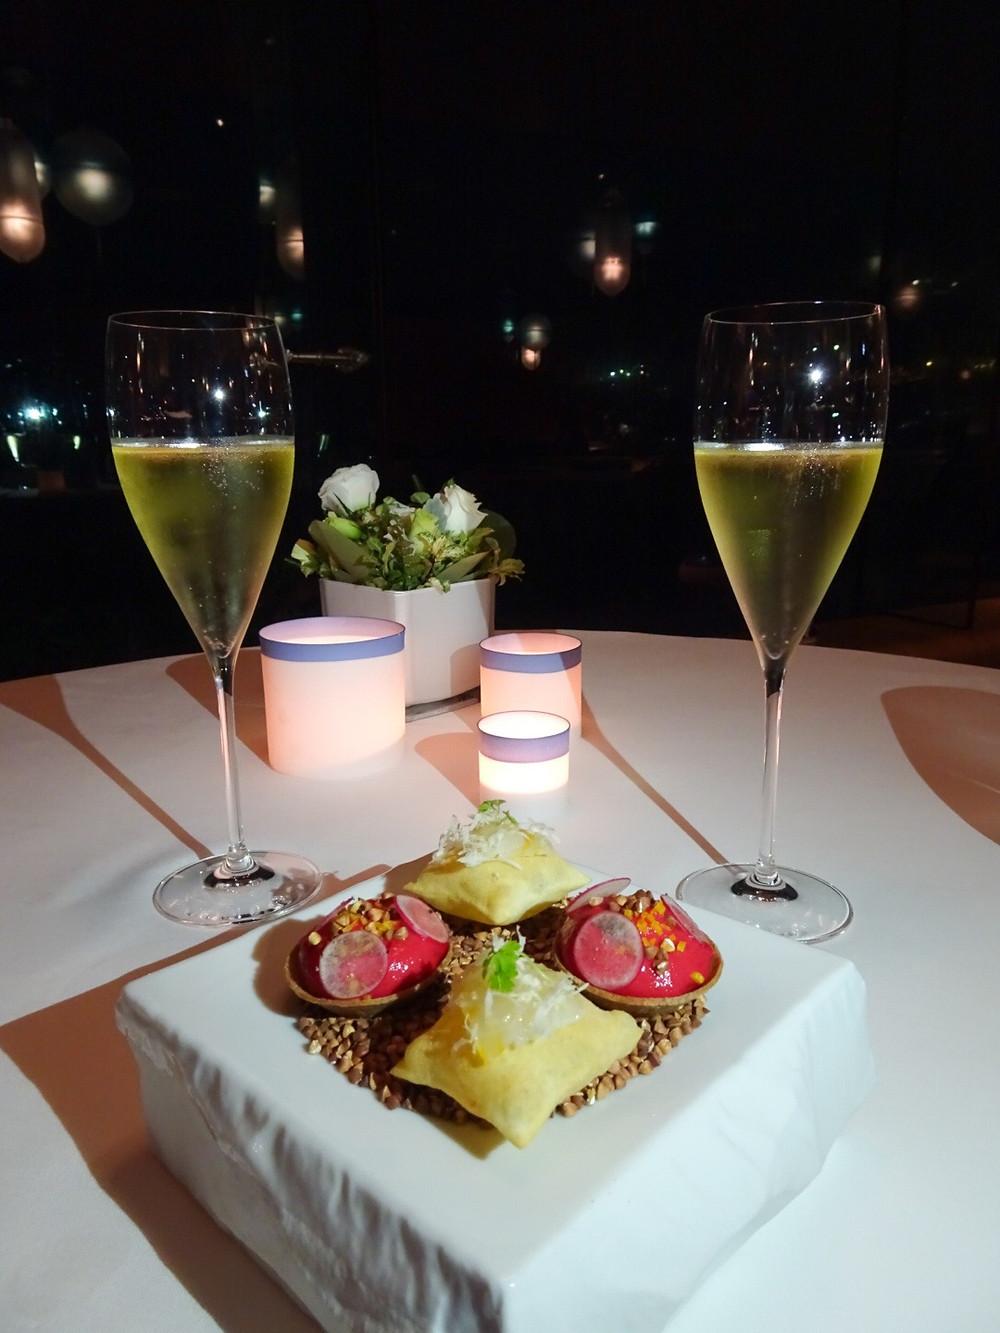 Food at The Ocean by Olivier Bellin restaurant in Hong Kong